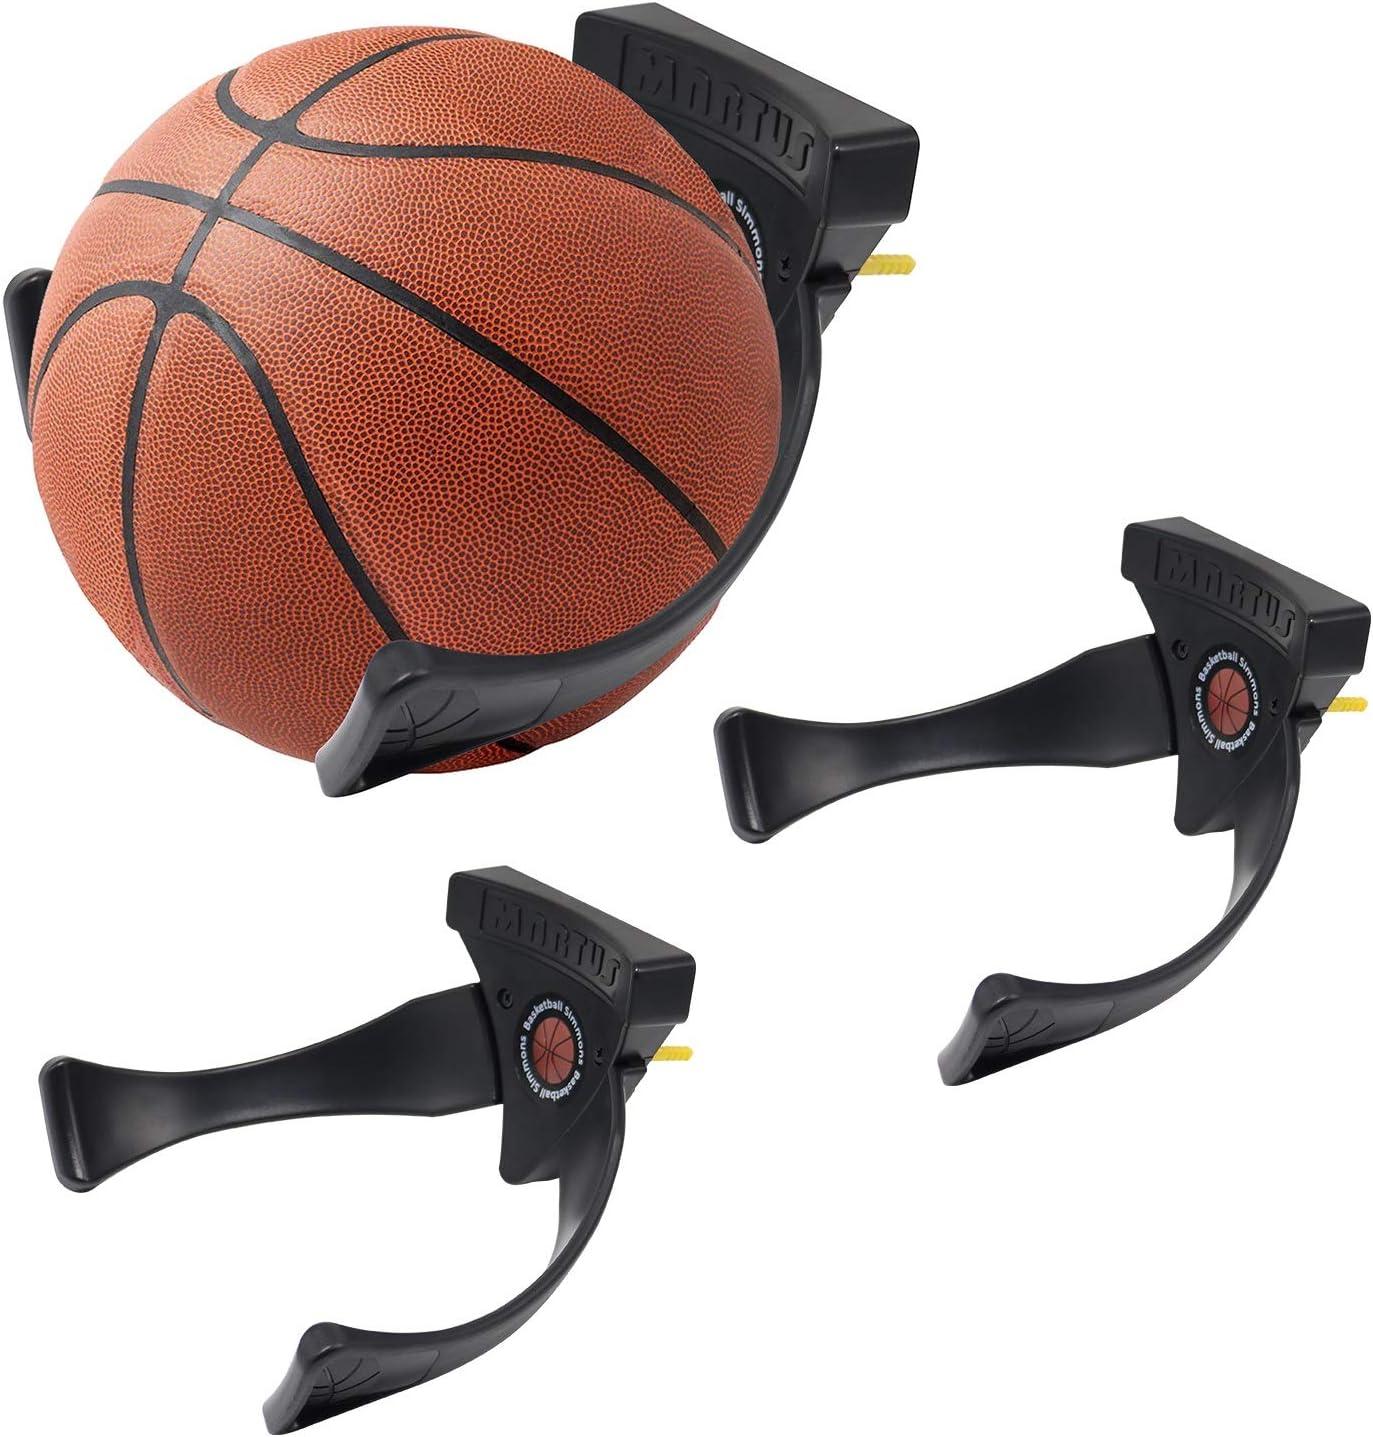 Jolitac Wall Mounted Ball Holder Display Sports Balls Storage and Decoration Shelf Black Self-Sticking Claw Racks